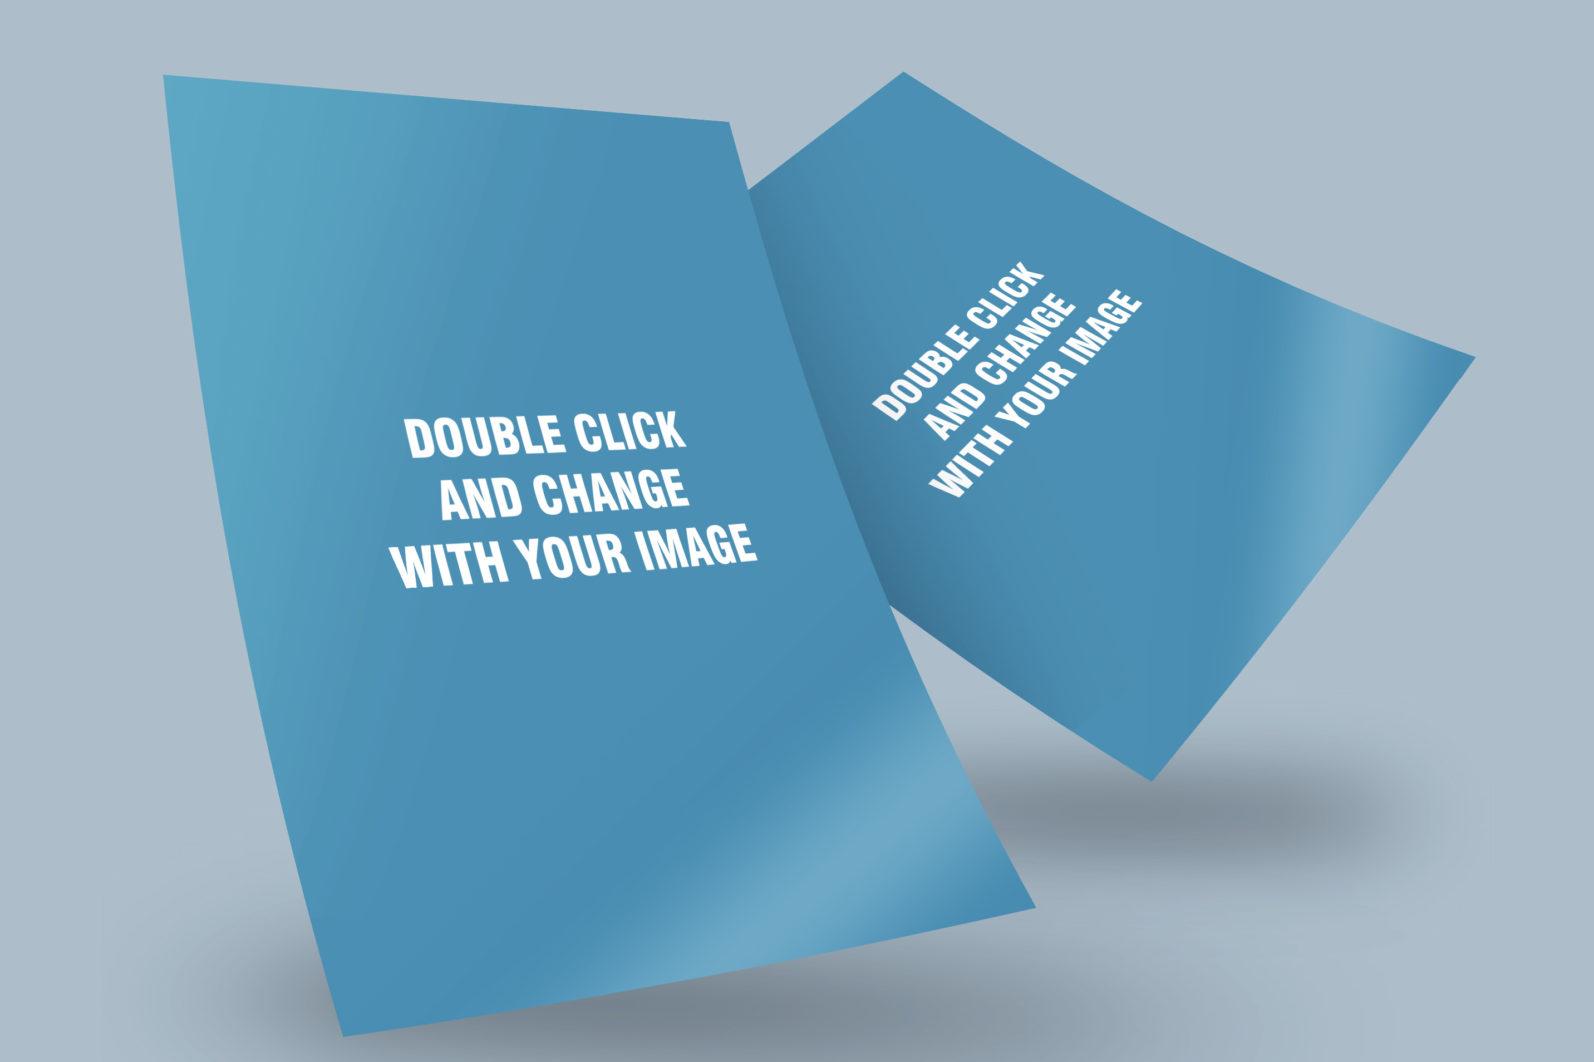 Resume and Flyer PSD Mockup - Mockup Flyer 9 scaled -